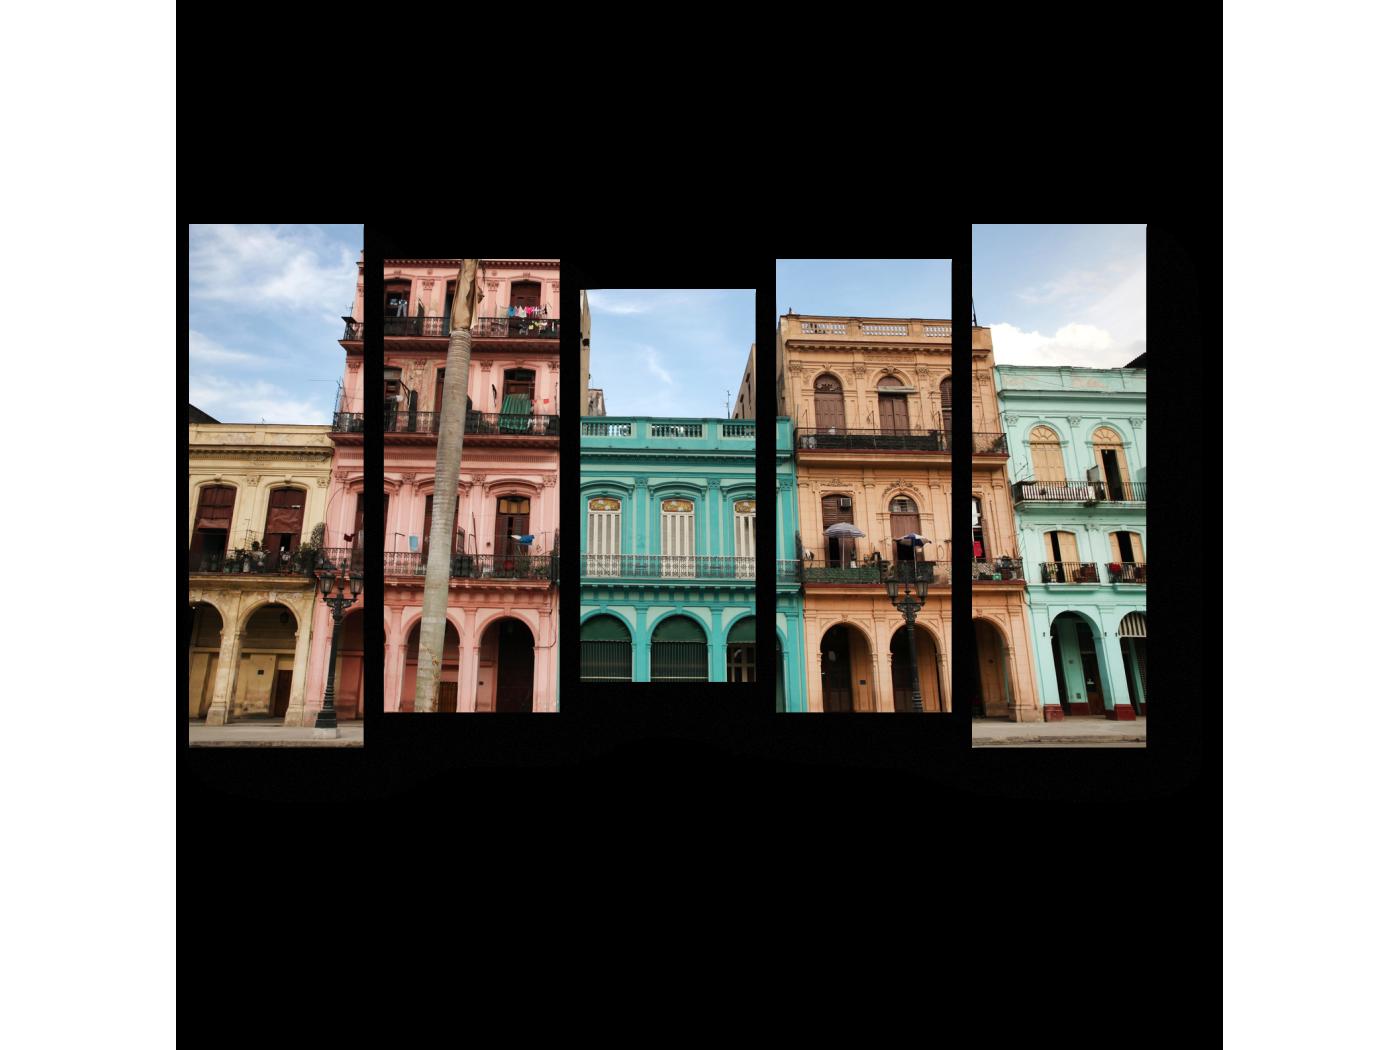 Модульная картина Архитектура на Пасео дель Прадо (90x54) фото